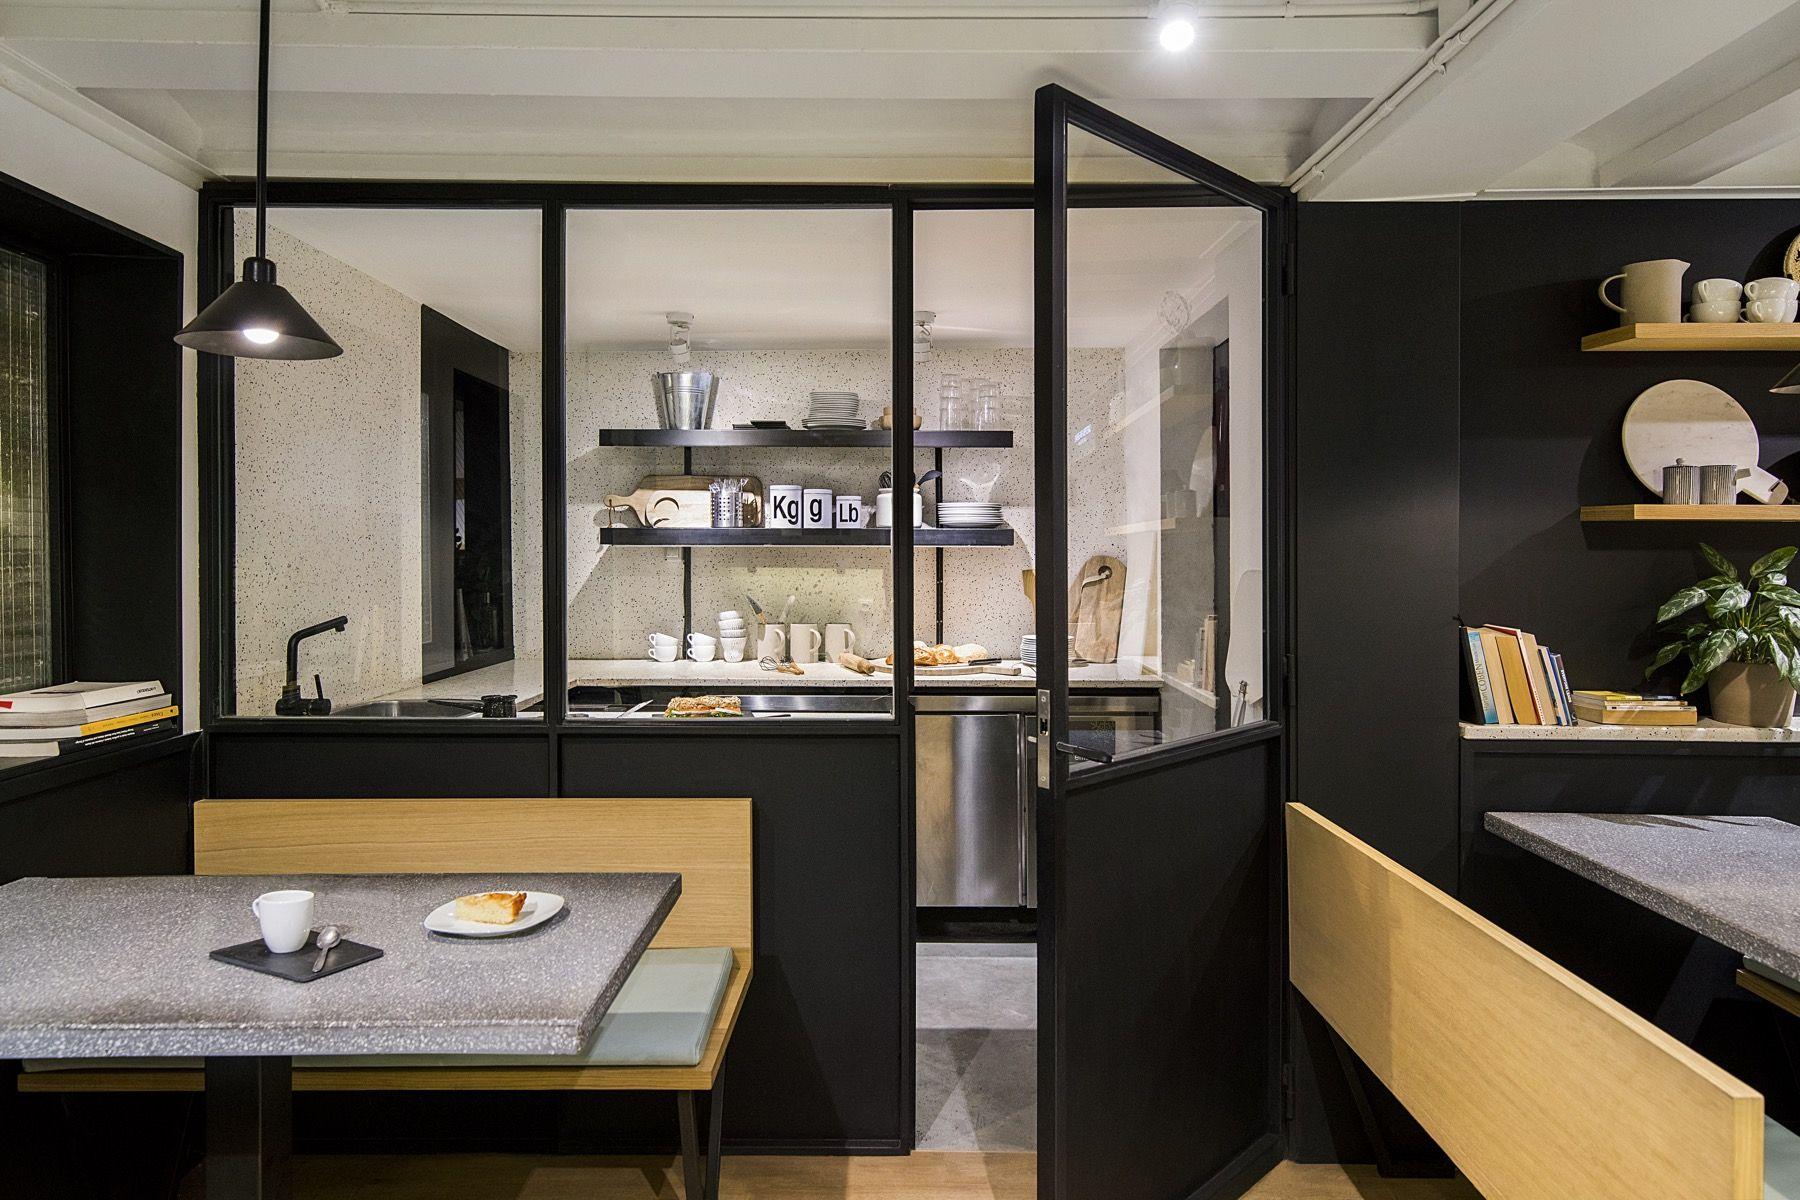 Parisienne Restaurante: Proyectos de Interiorismo Miriam Barrio